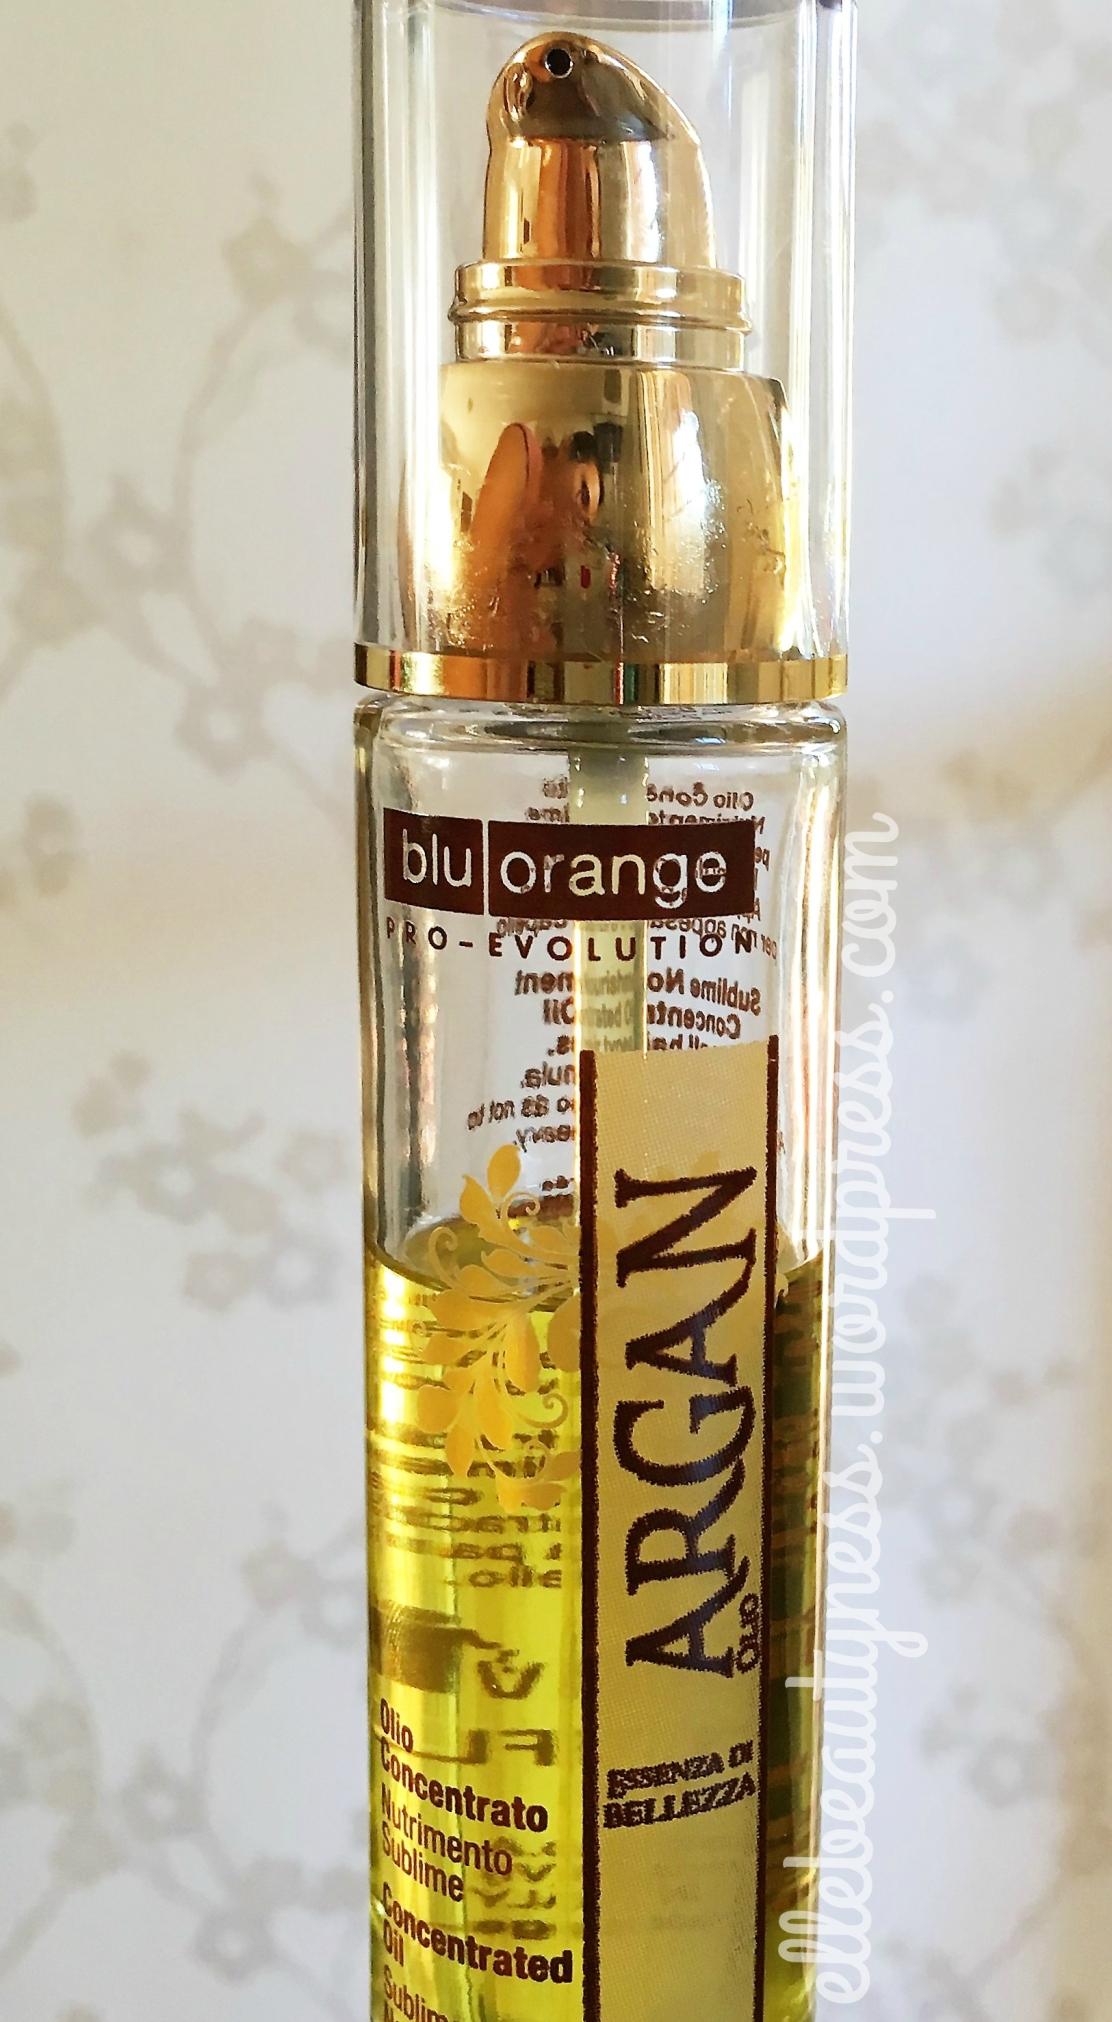 keratin cheratina shampoo maschera olio cristalli pure blu orange review recensione elle beautyness beauty d haircare capelli arga.jpg